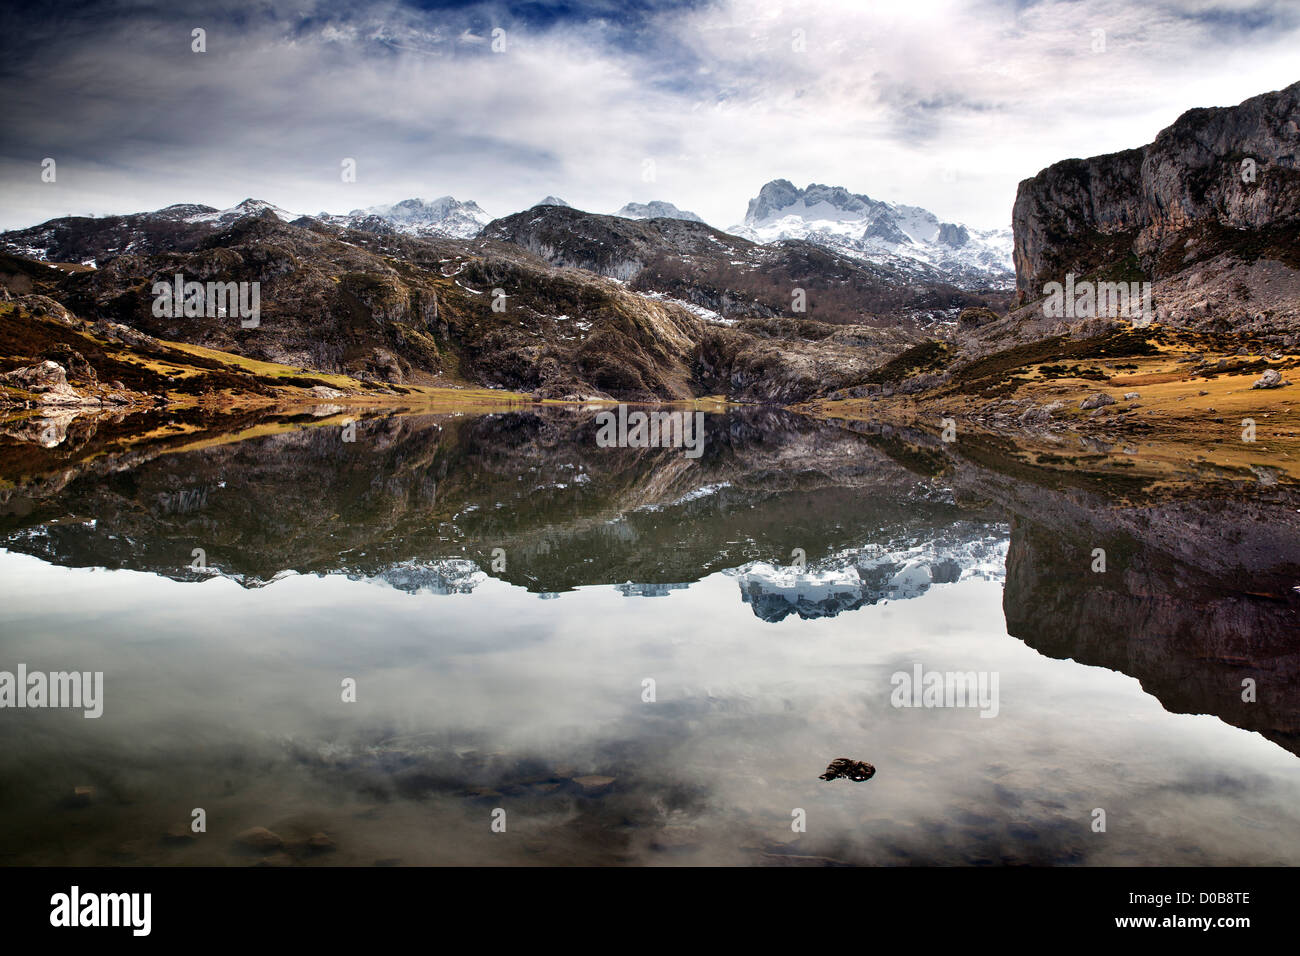 Ercina Lake Covadonga Picos de Europa Asturias Spain - Stock Image